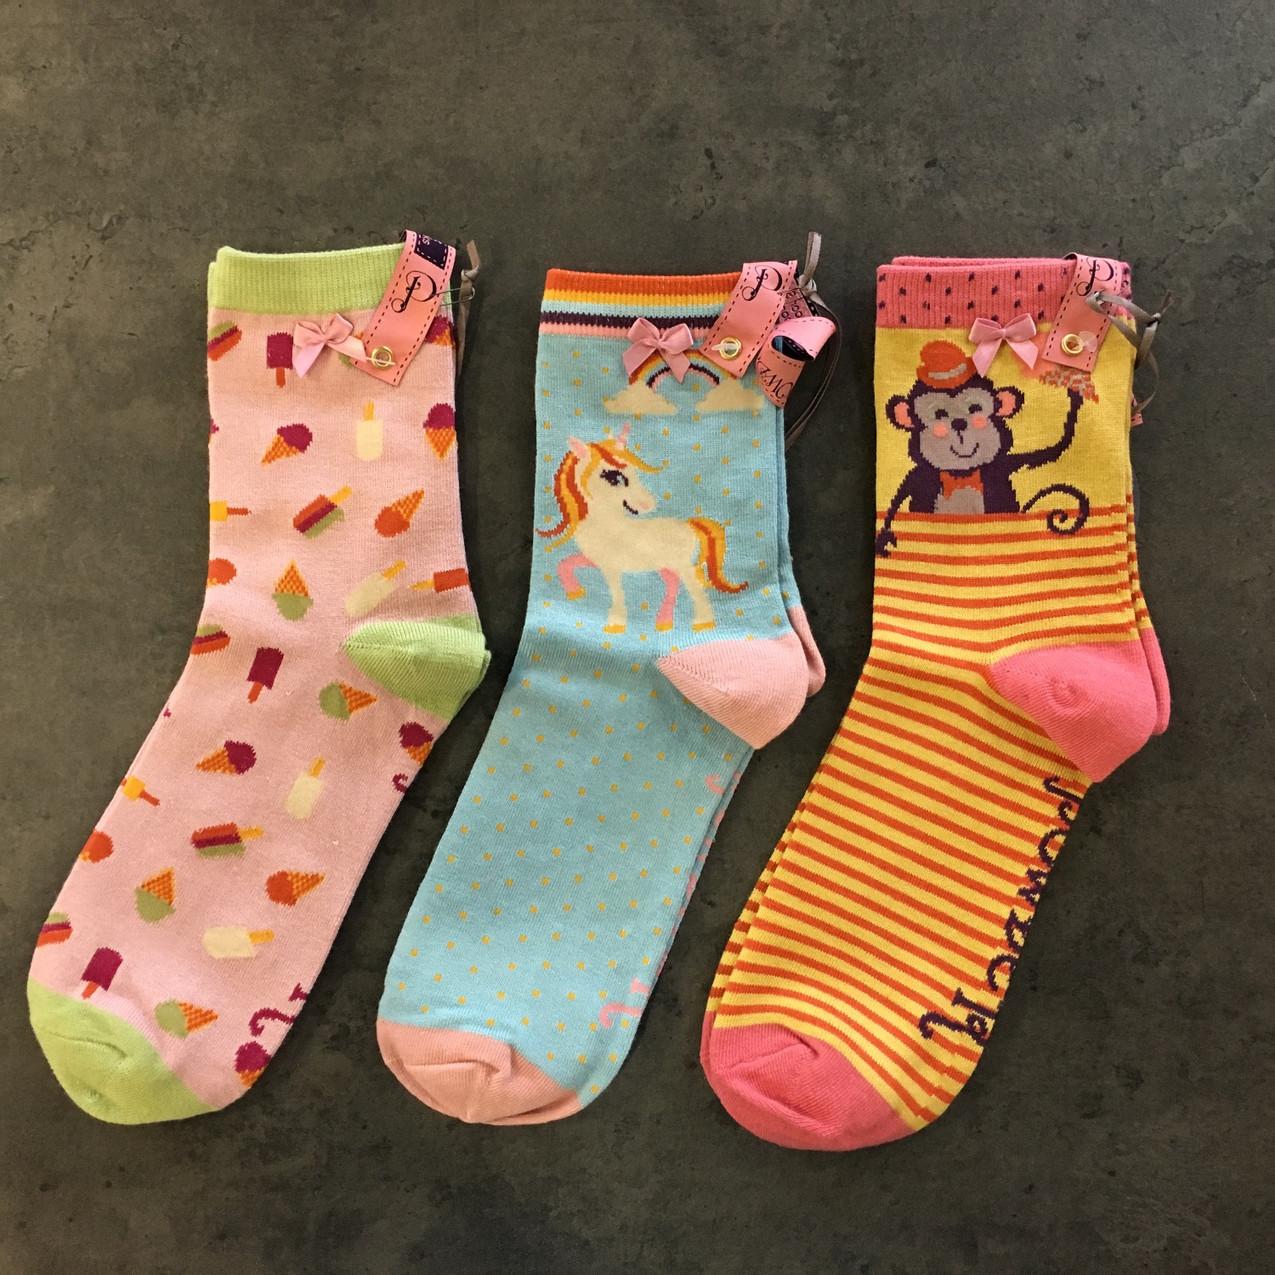 Powder Ankle Socks 1